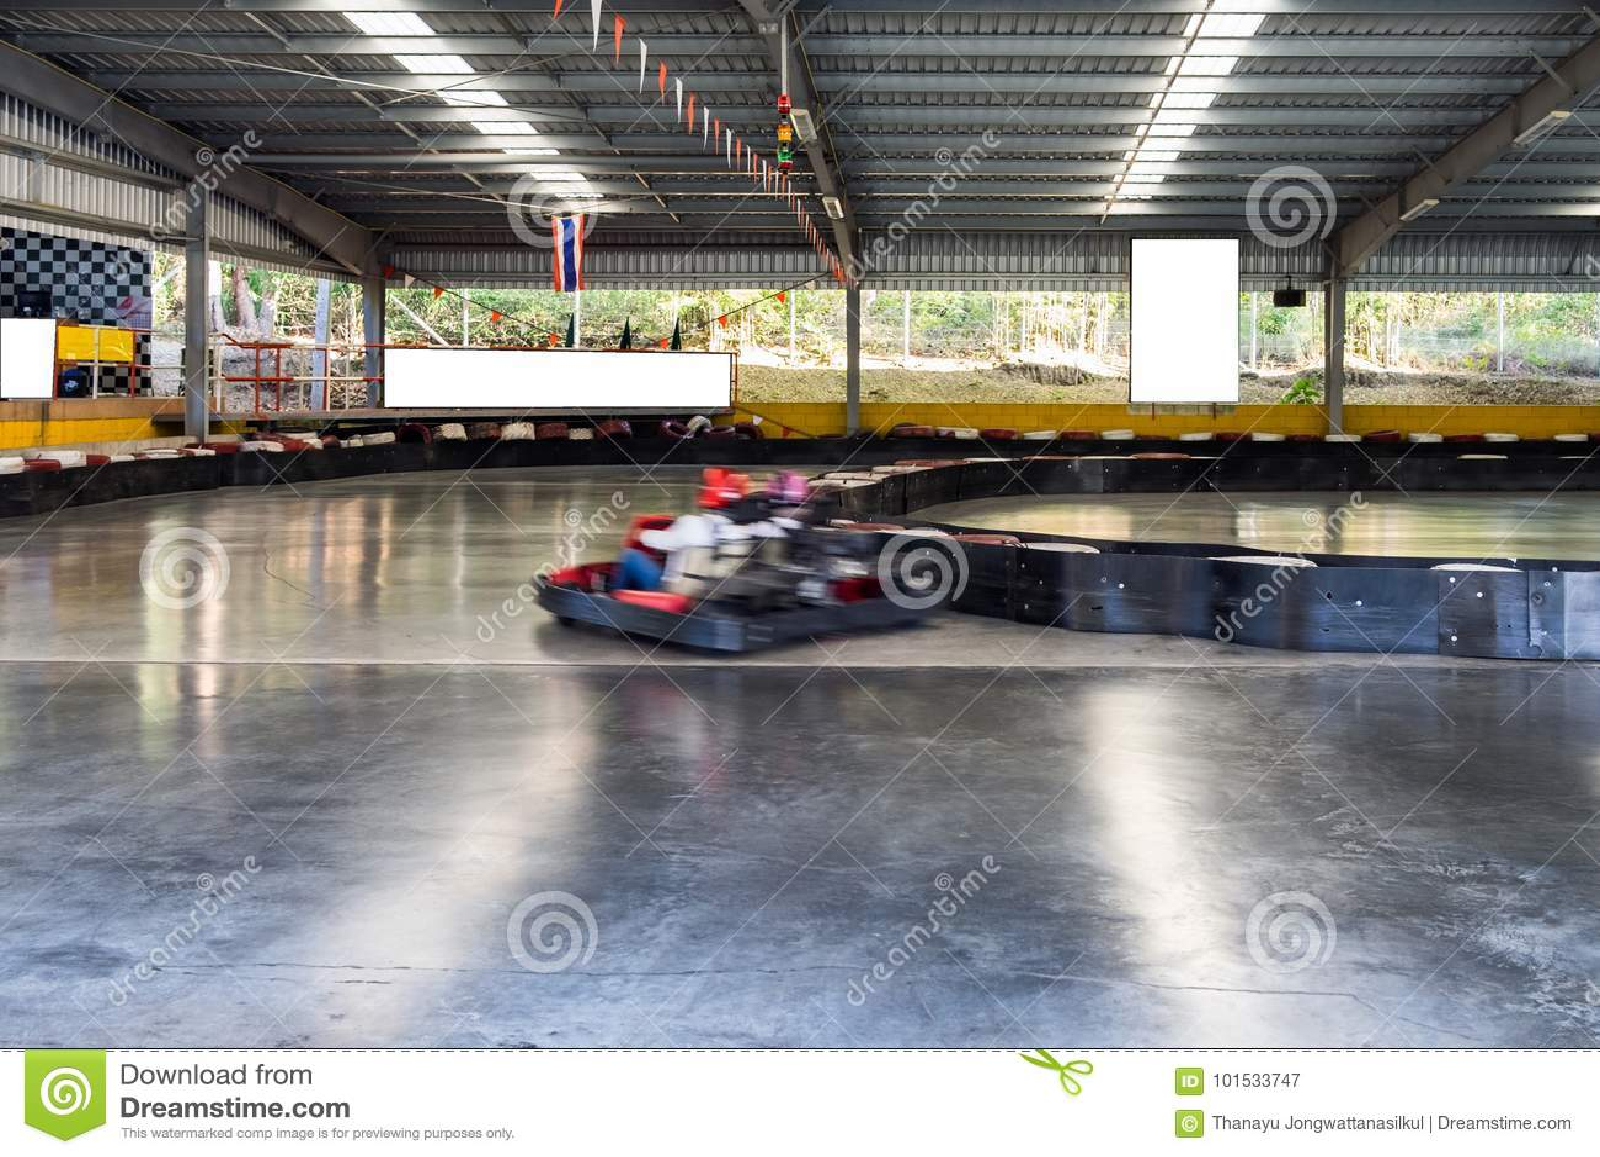 Go-kart motion drive in track